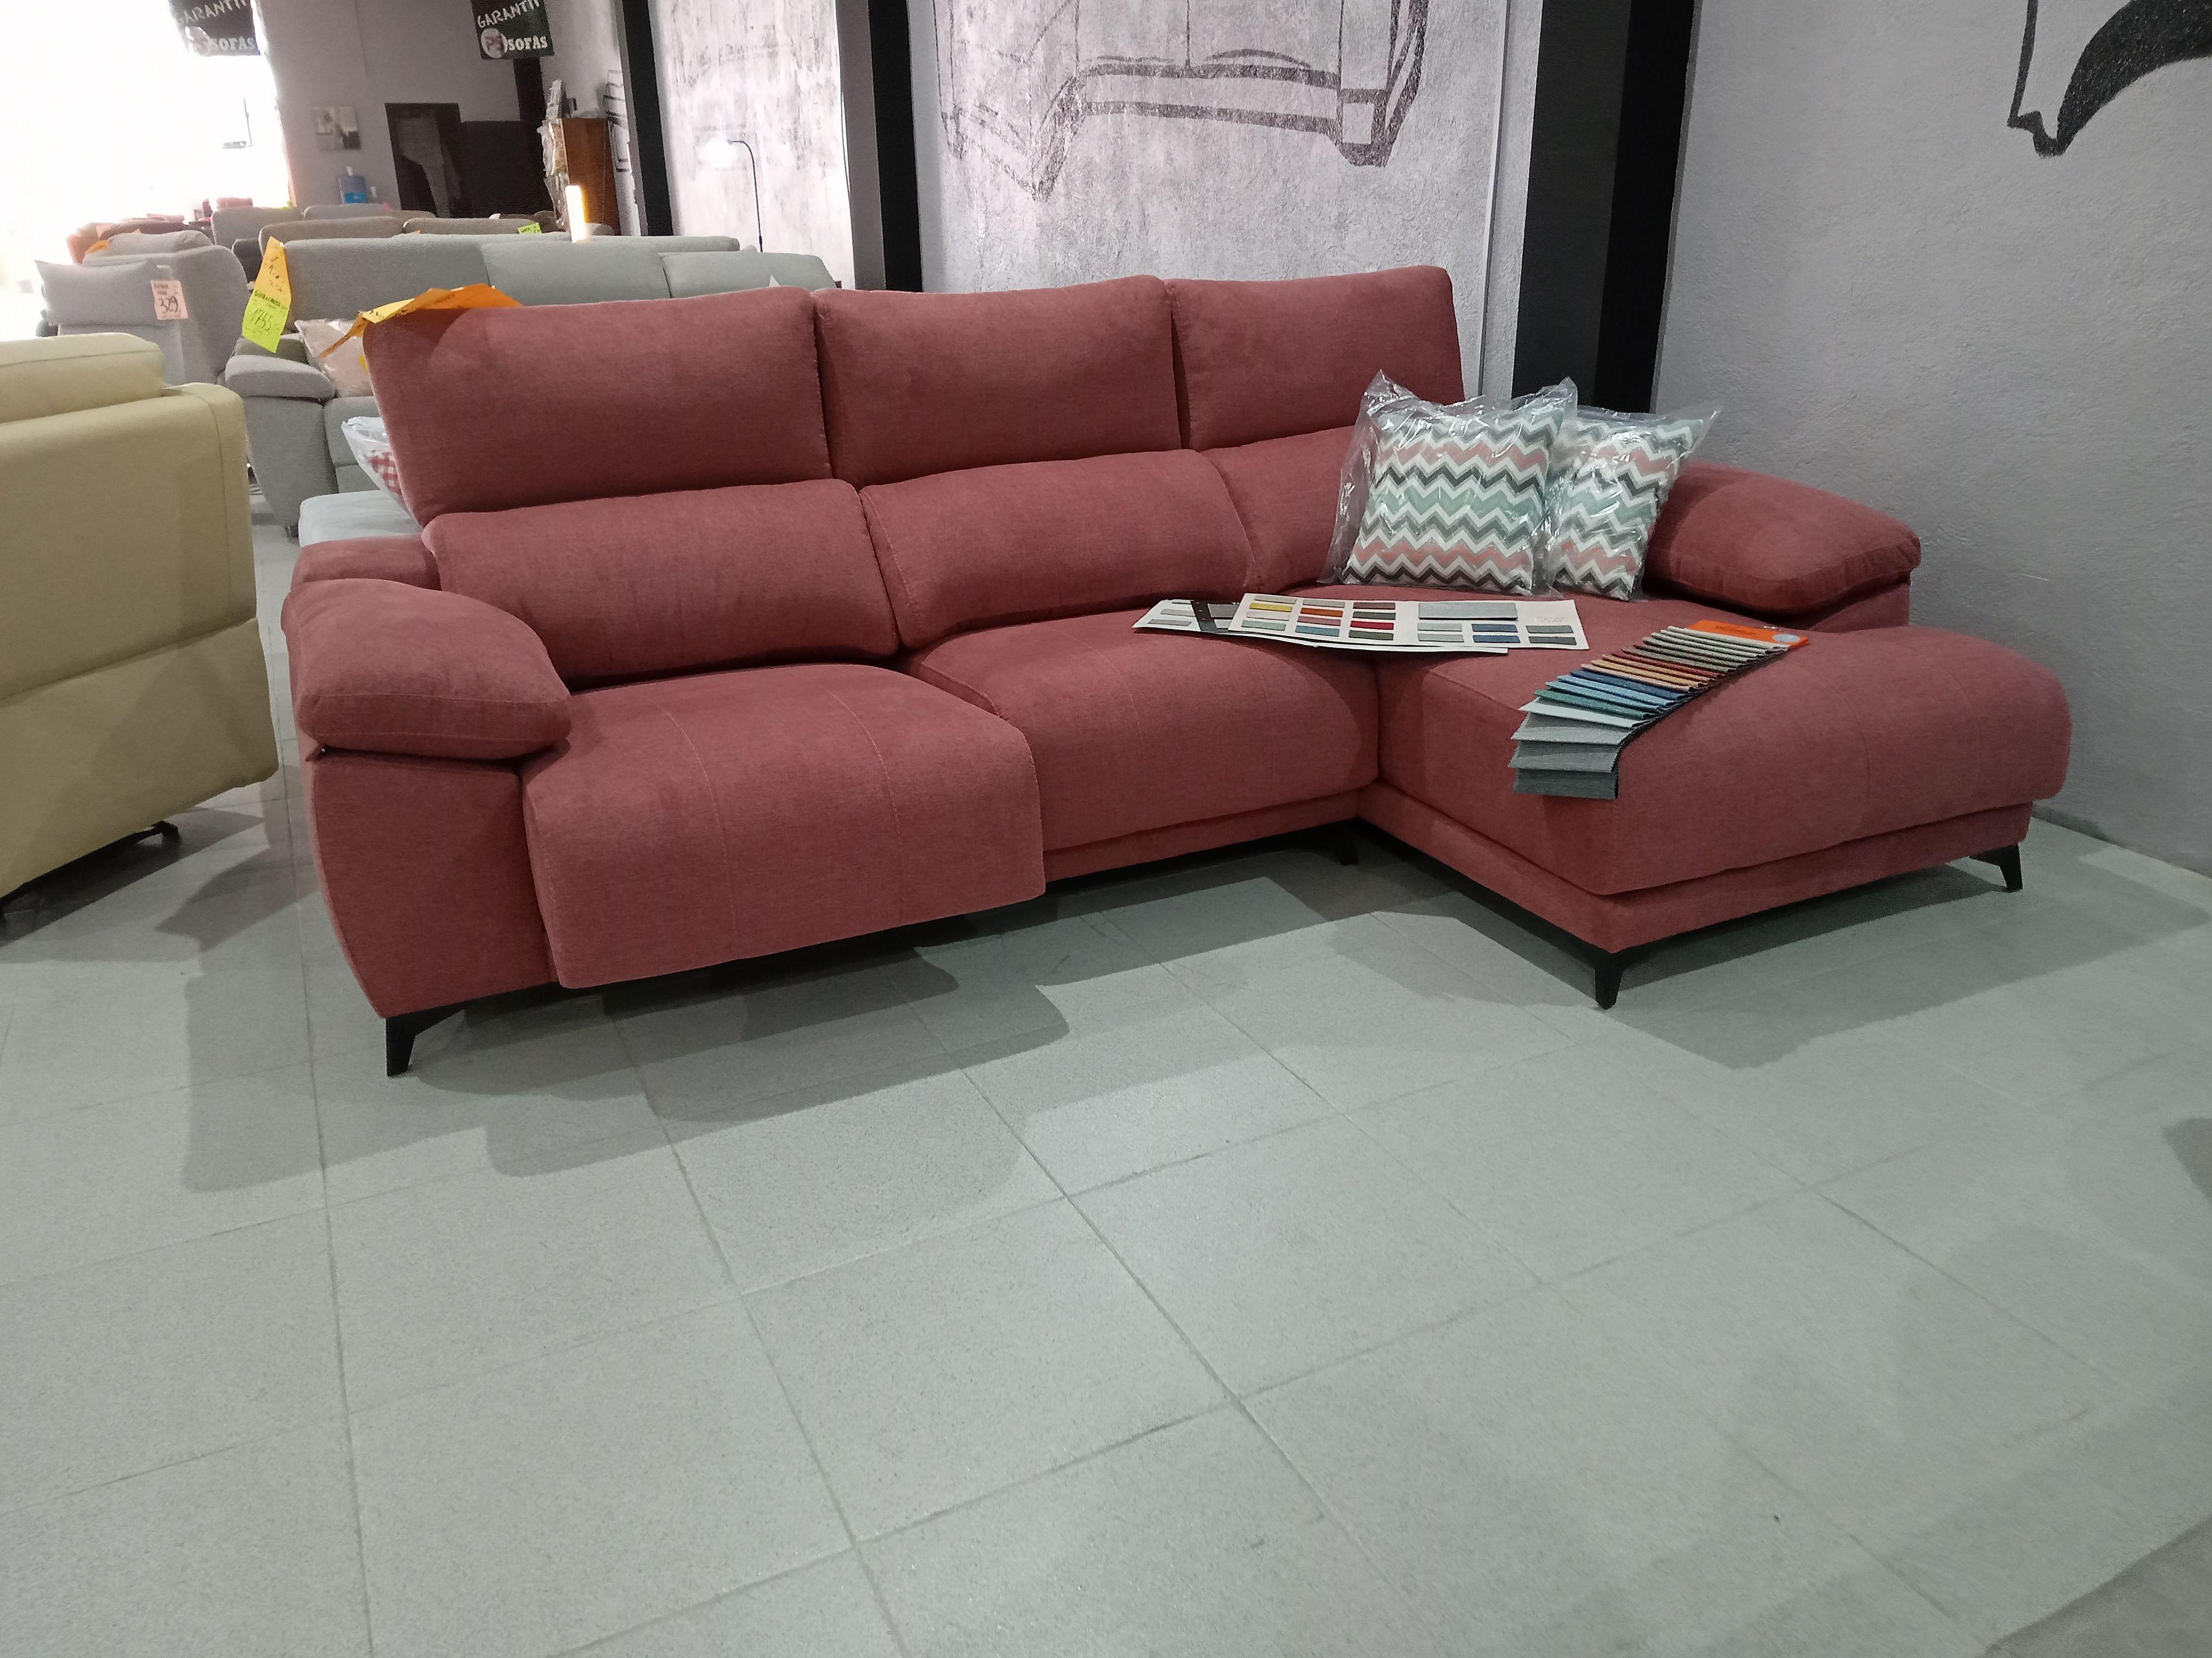 Foto 2 de Colchones, sofás y canapés en    PS Sofás